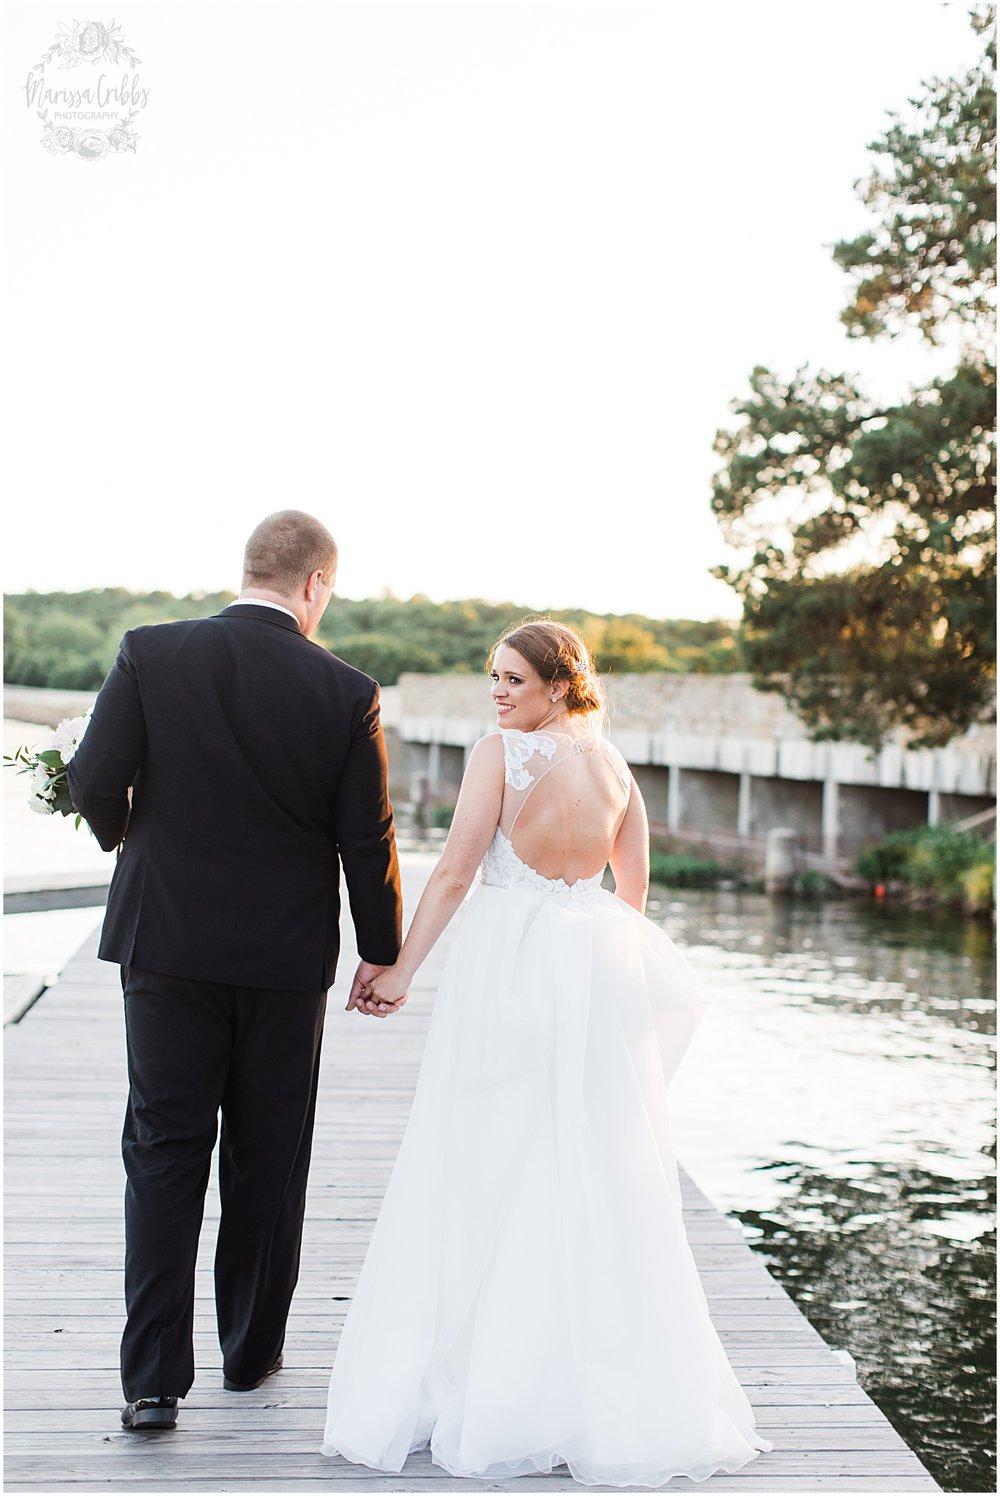 LAKE QUIVIRA COUNTRY CLUB WEDDING | MORGAN & RYAN | MARISSA CRIBBS PHOTOGRAPHY_5536.jpg